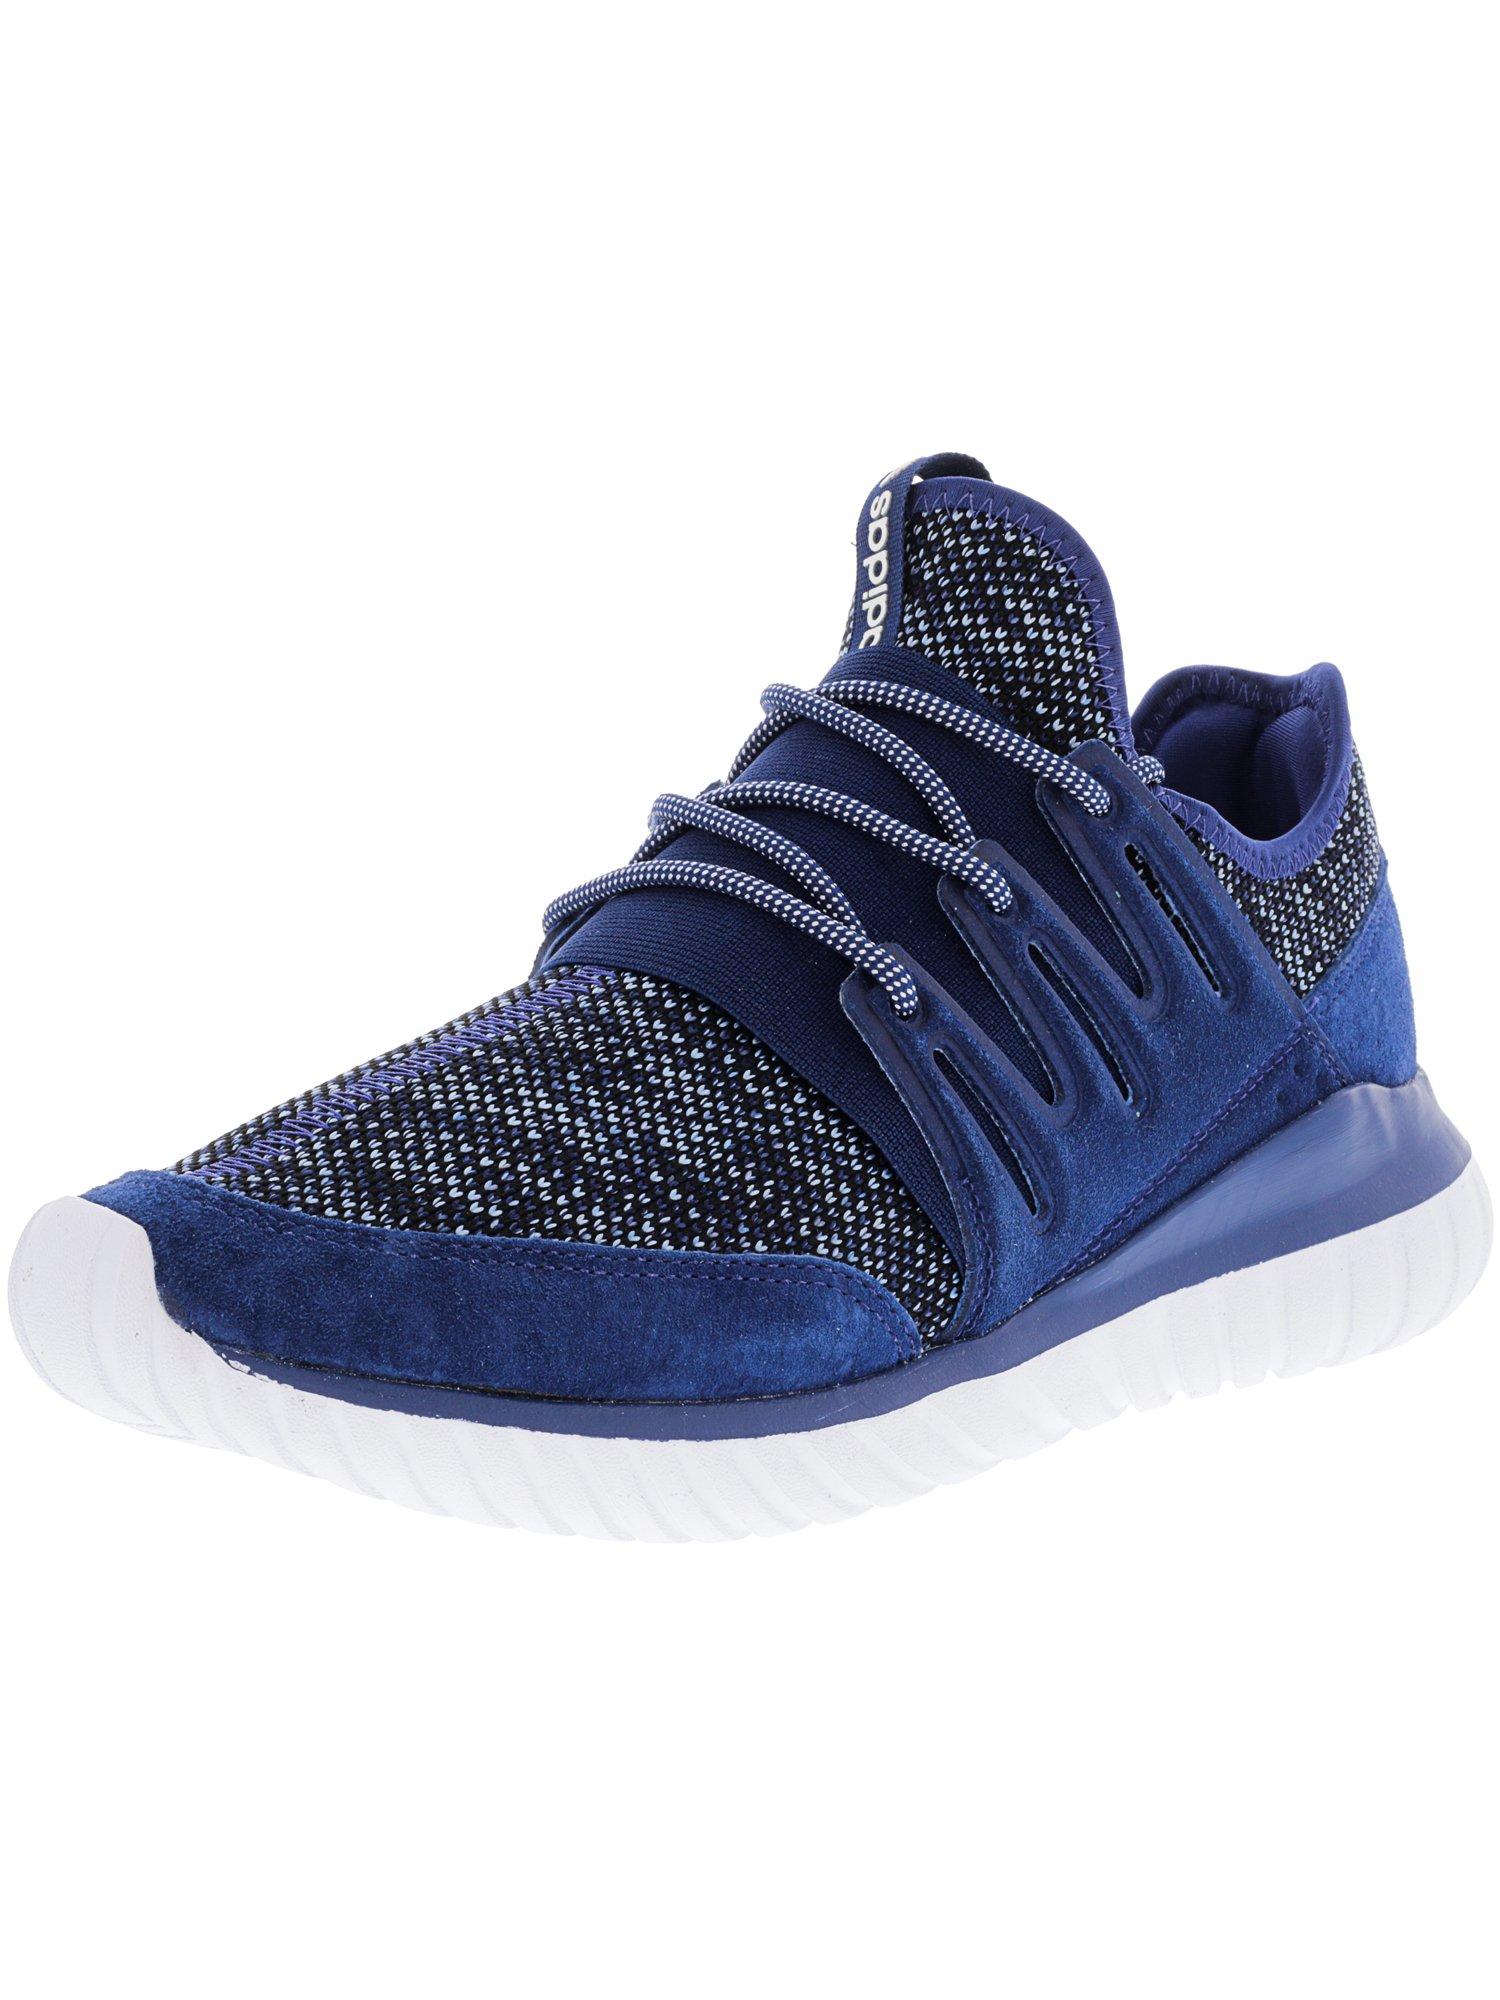 f307dca3ac AreaTrend: Nike Men's Stefan Janoski Max L Obsidian / Dark Ankle ...